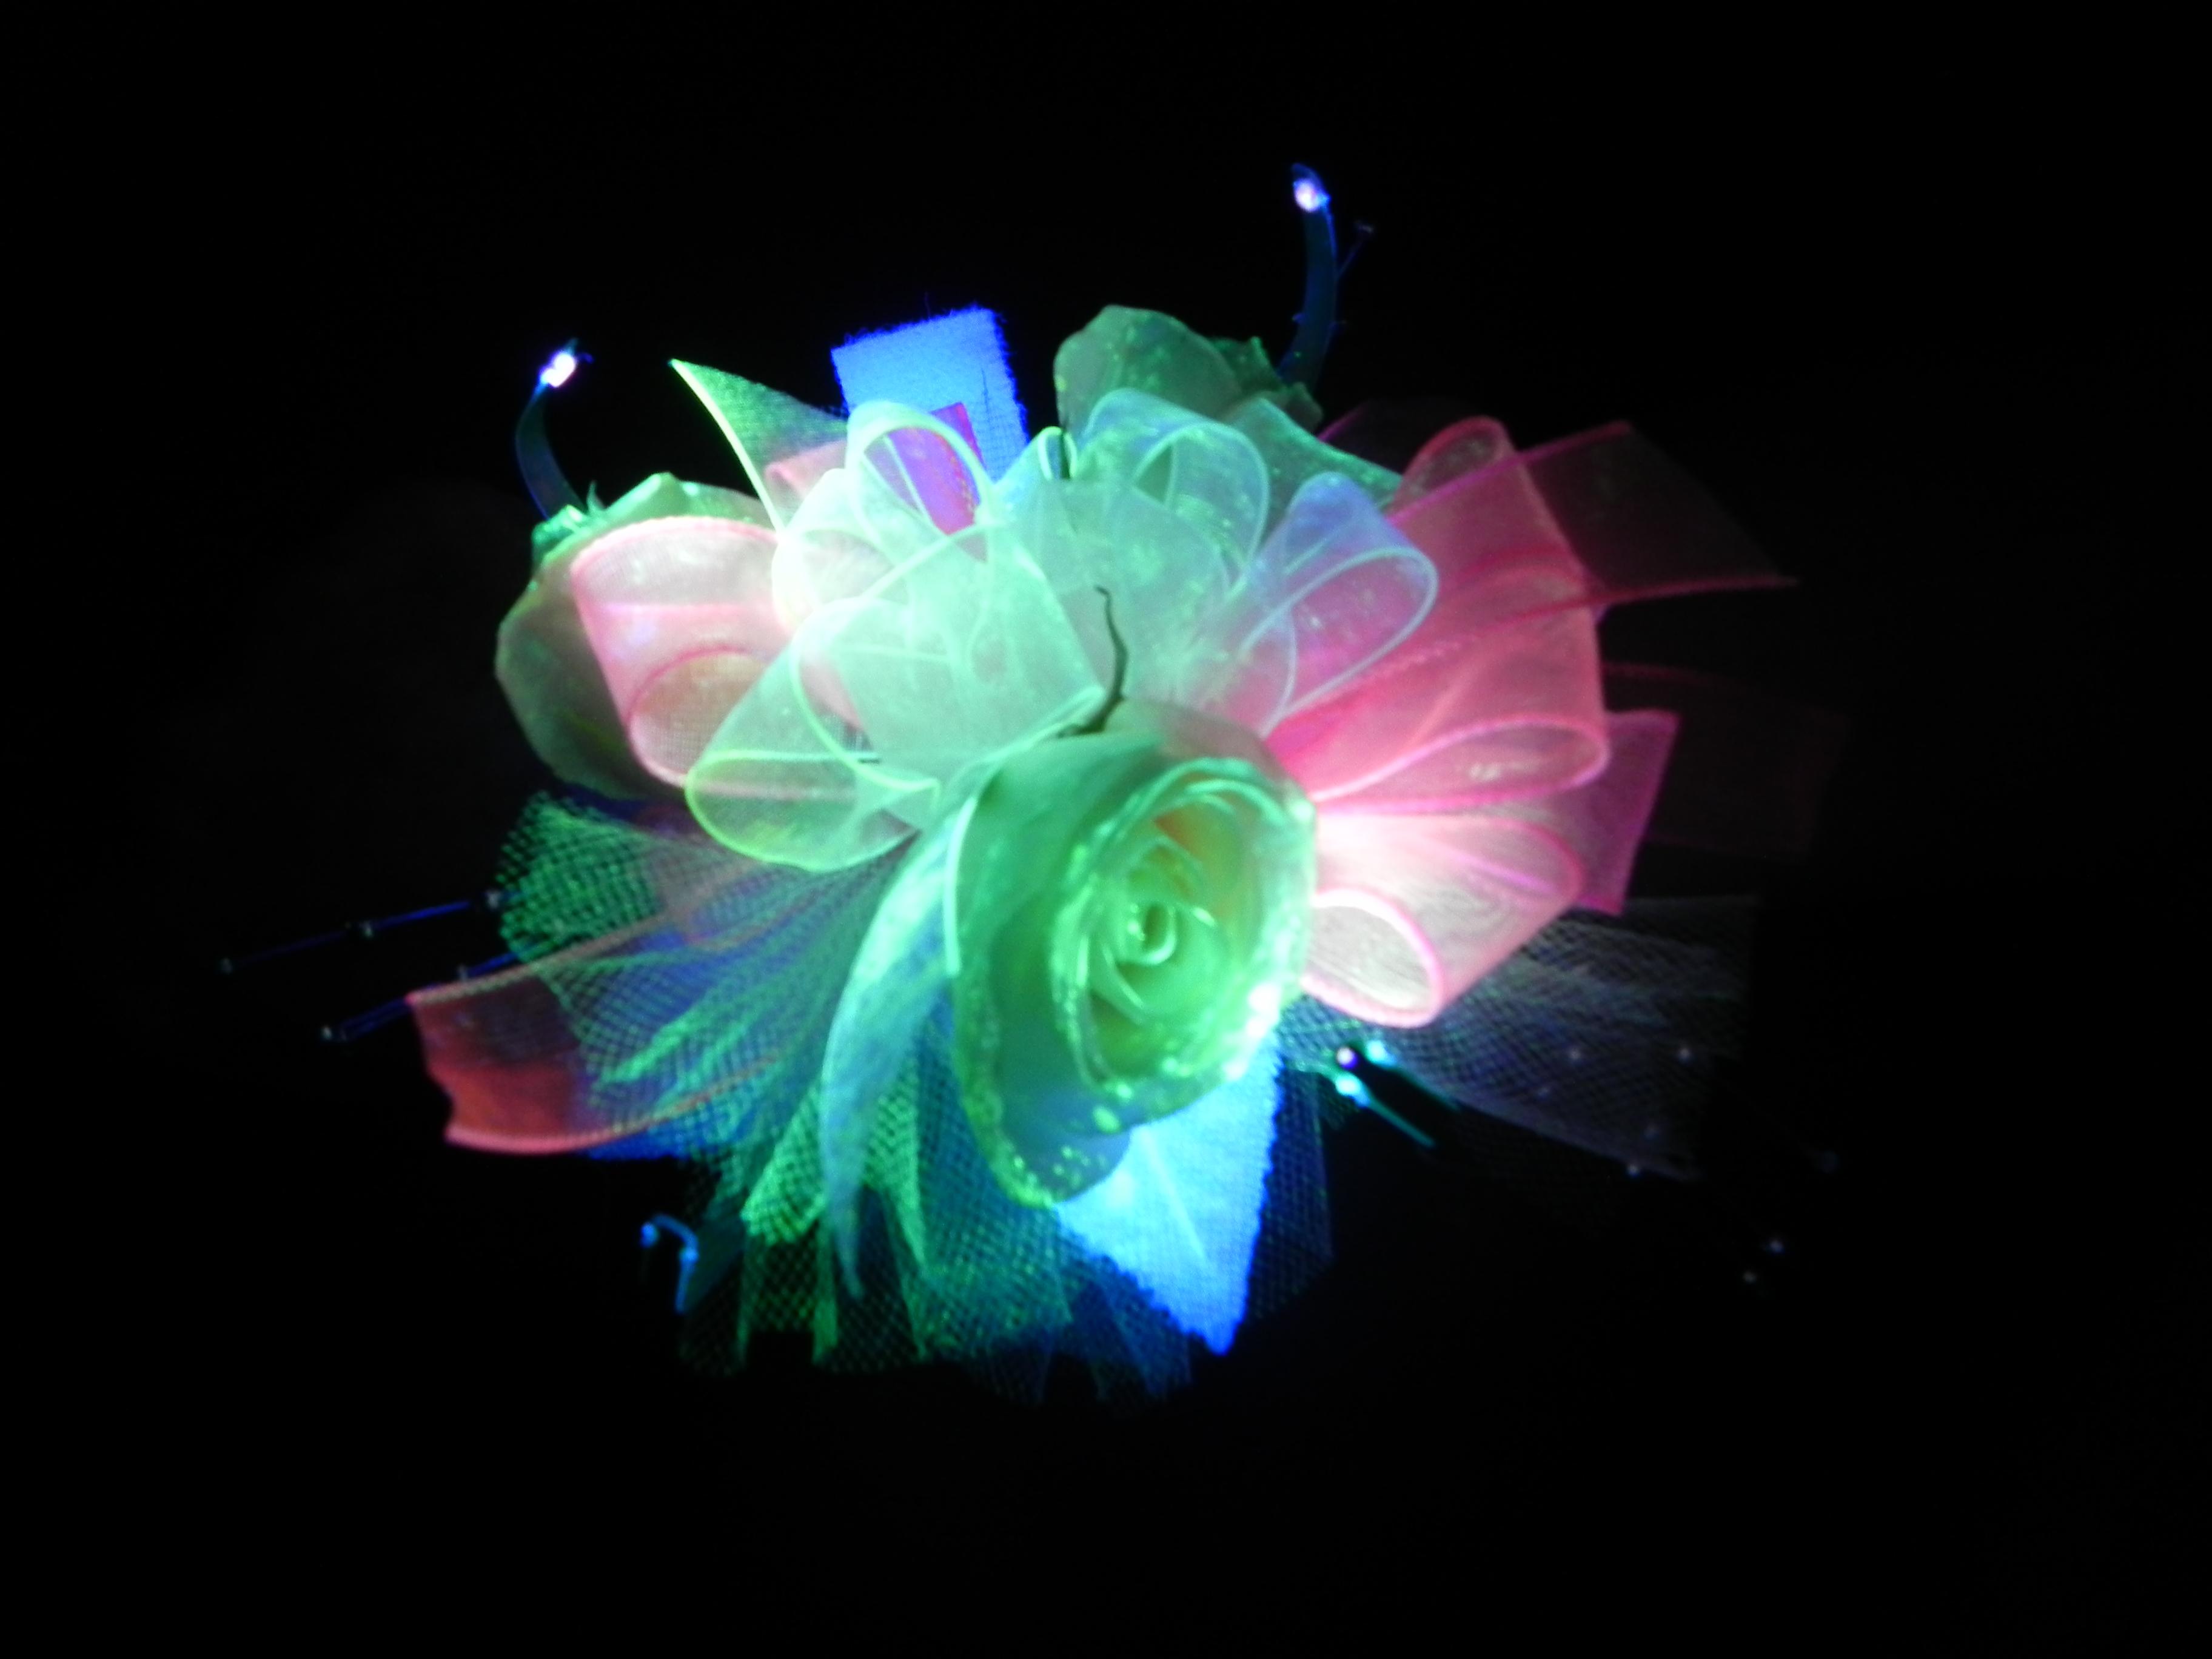 Glowing fluorescence prom flowers